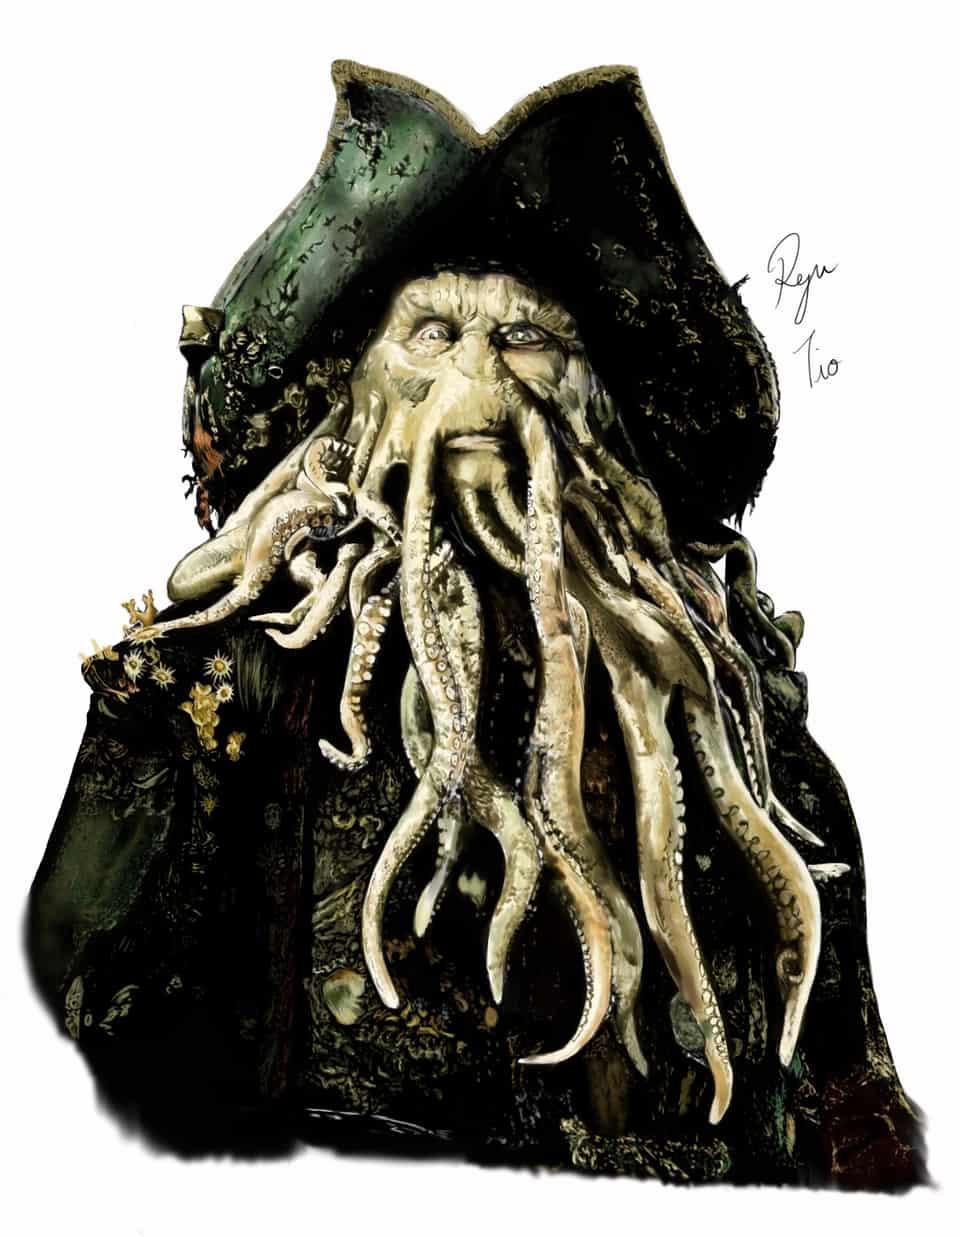 Davy Jones Illust of チオ 海賊 illustration pirates